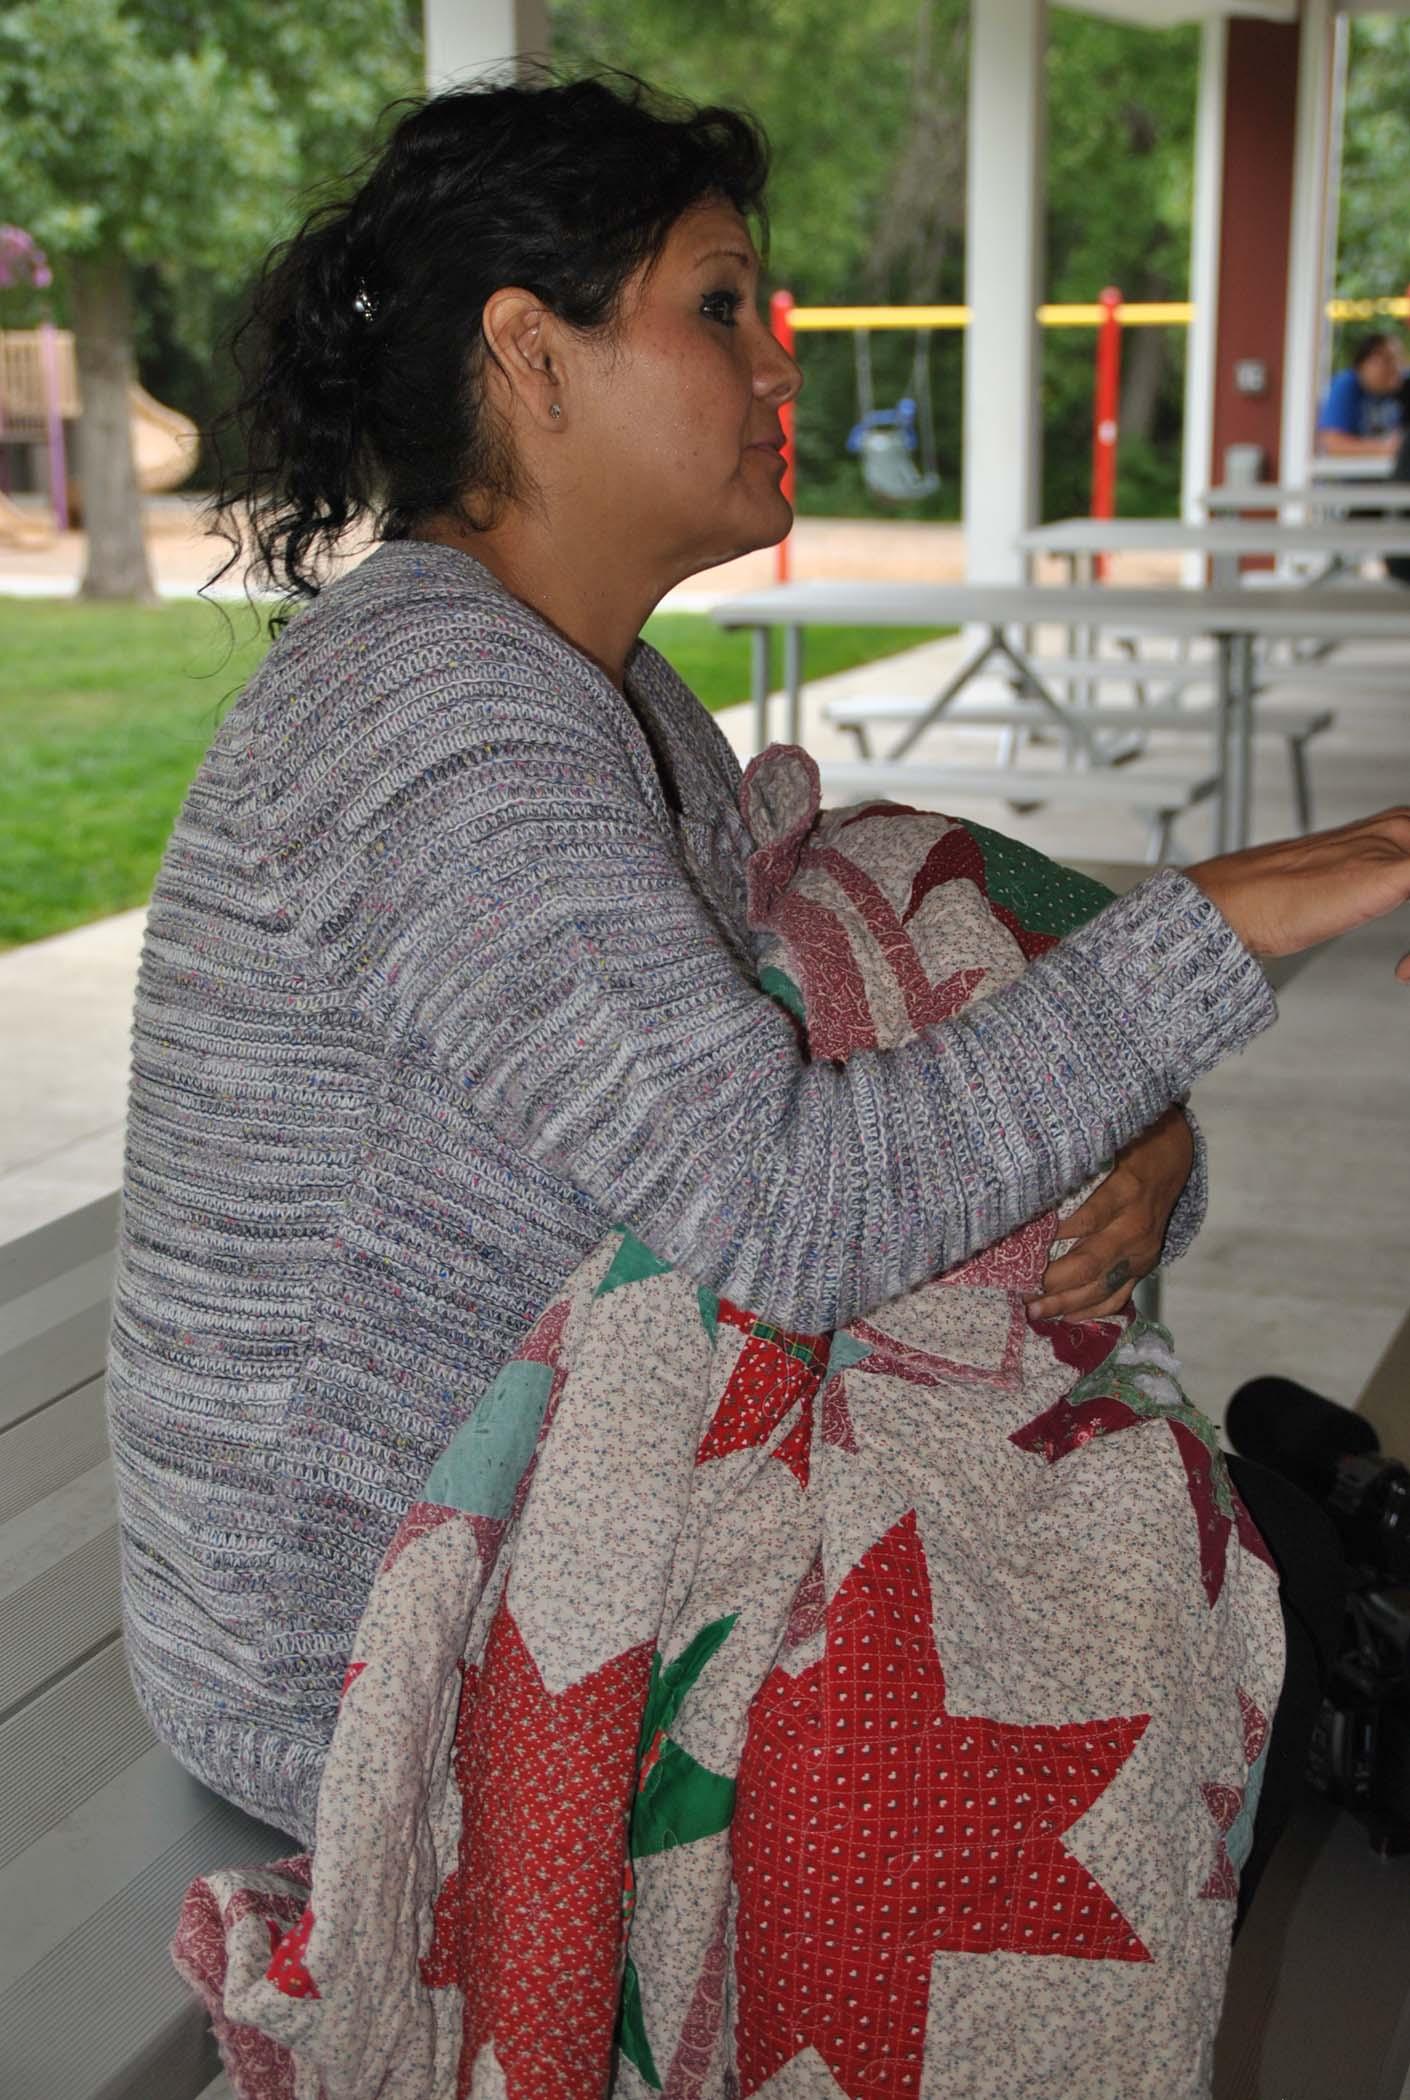 Tarita Silk, Savanna Greywind's aunt, talks to volunteers - photo by C.S. Hagen